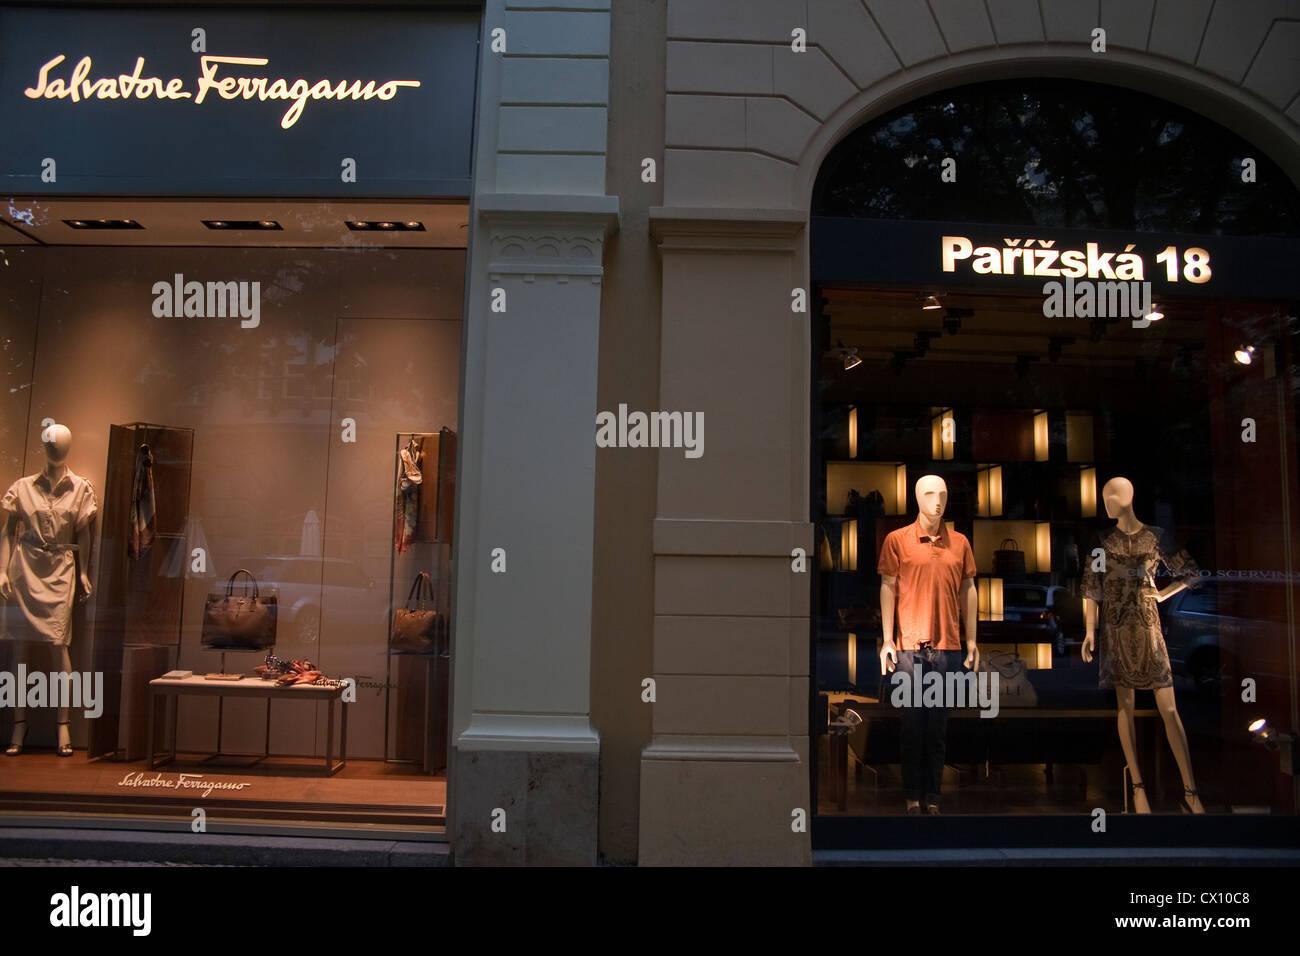 Parizska 18 Salvatore Ferragamo stores in Parizska Street in Prague Czech Republic on May 23 2012 Parizska Street - Stock Image